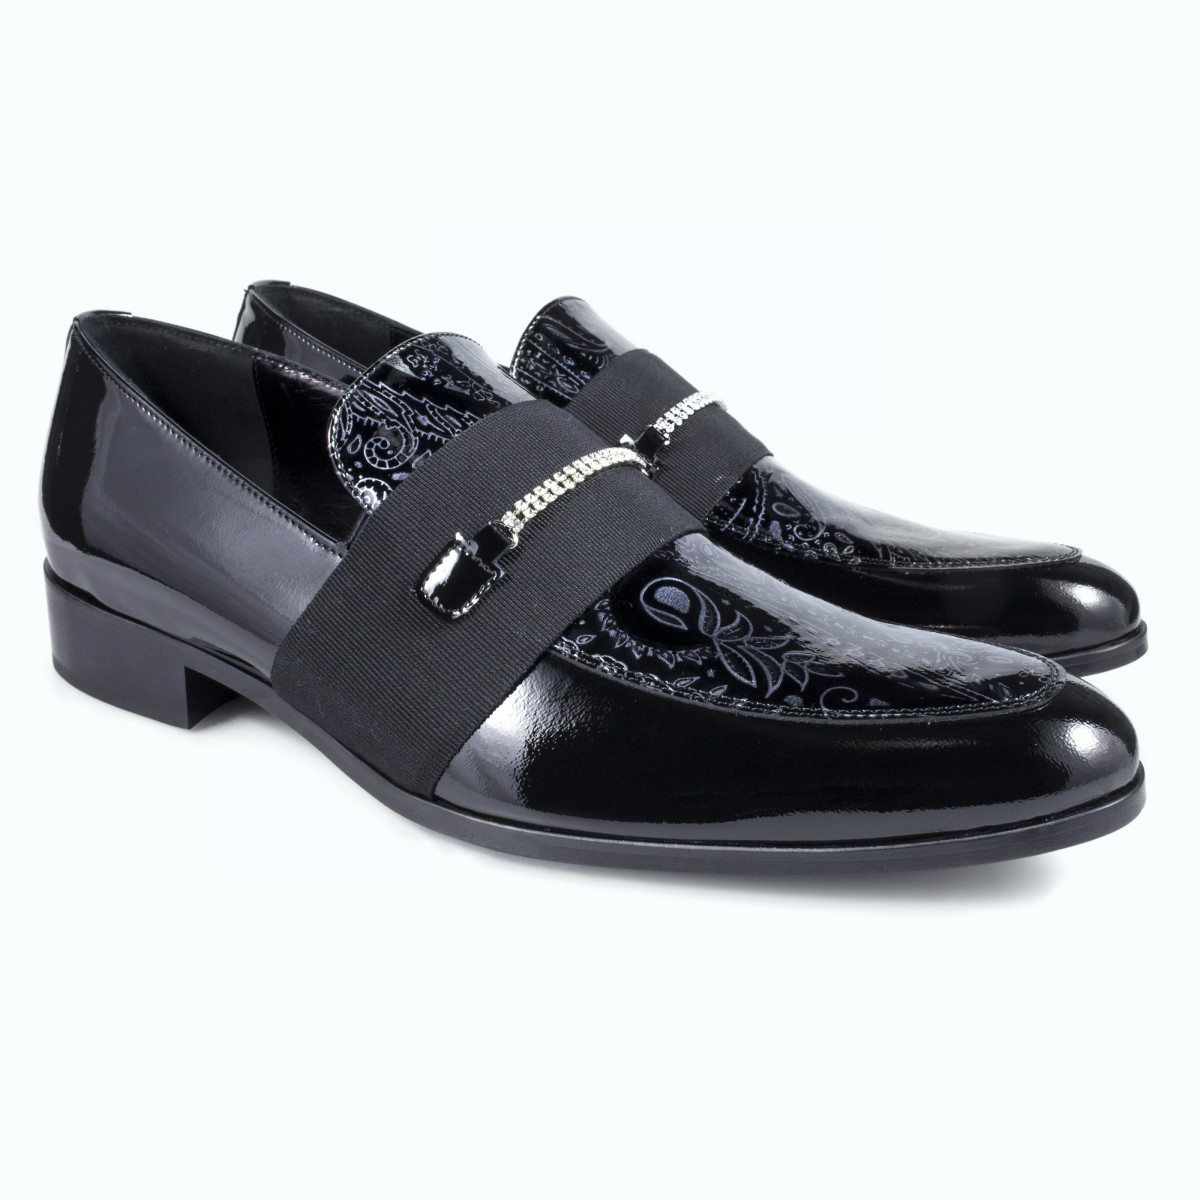 Mocassino Uomo Matrimonio : Scarpe eleganti da uomo mocassino cerimonia